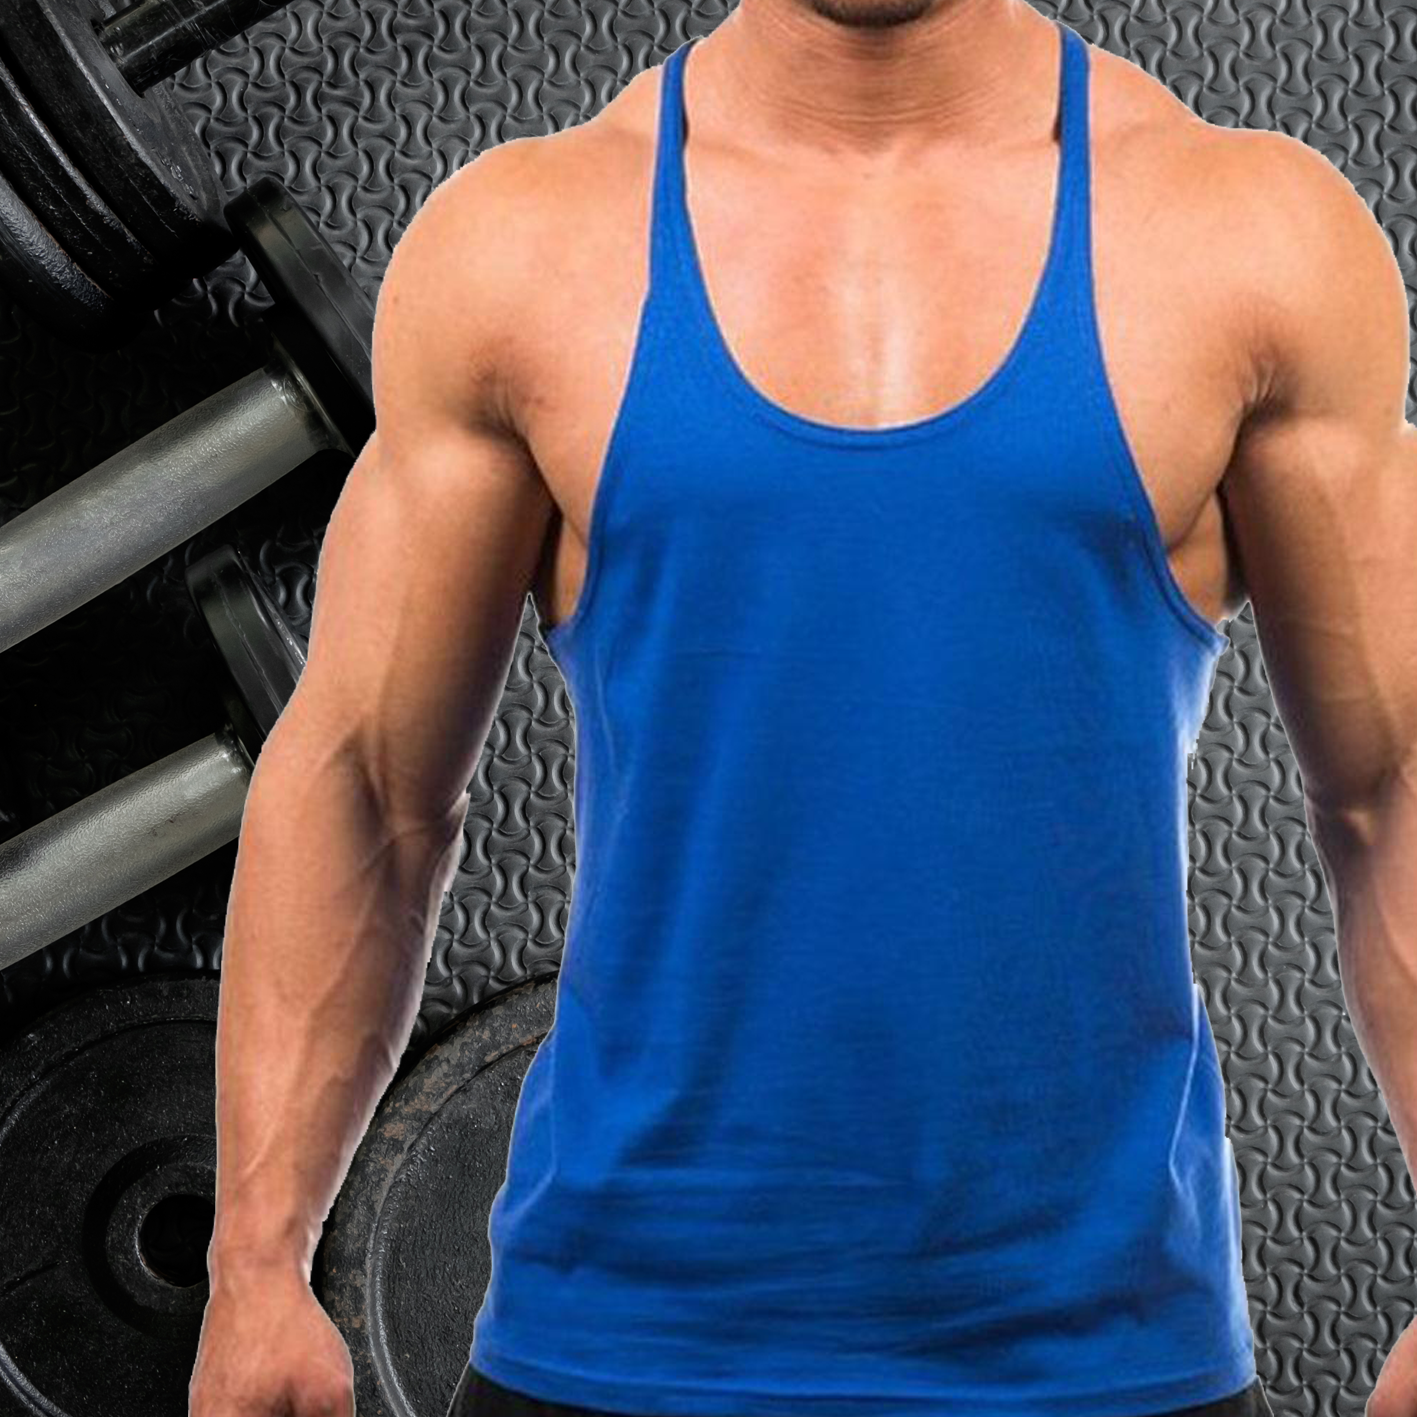 Mens Gym Vest Plain Stringer Bodybuilding Muscle Training Top Fitness Singlet 4